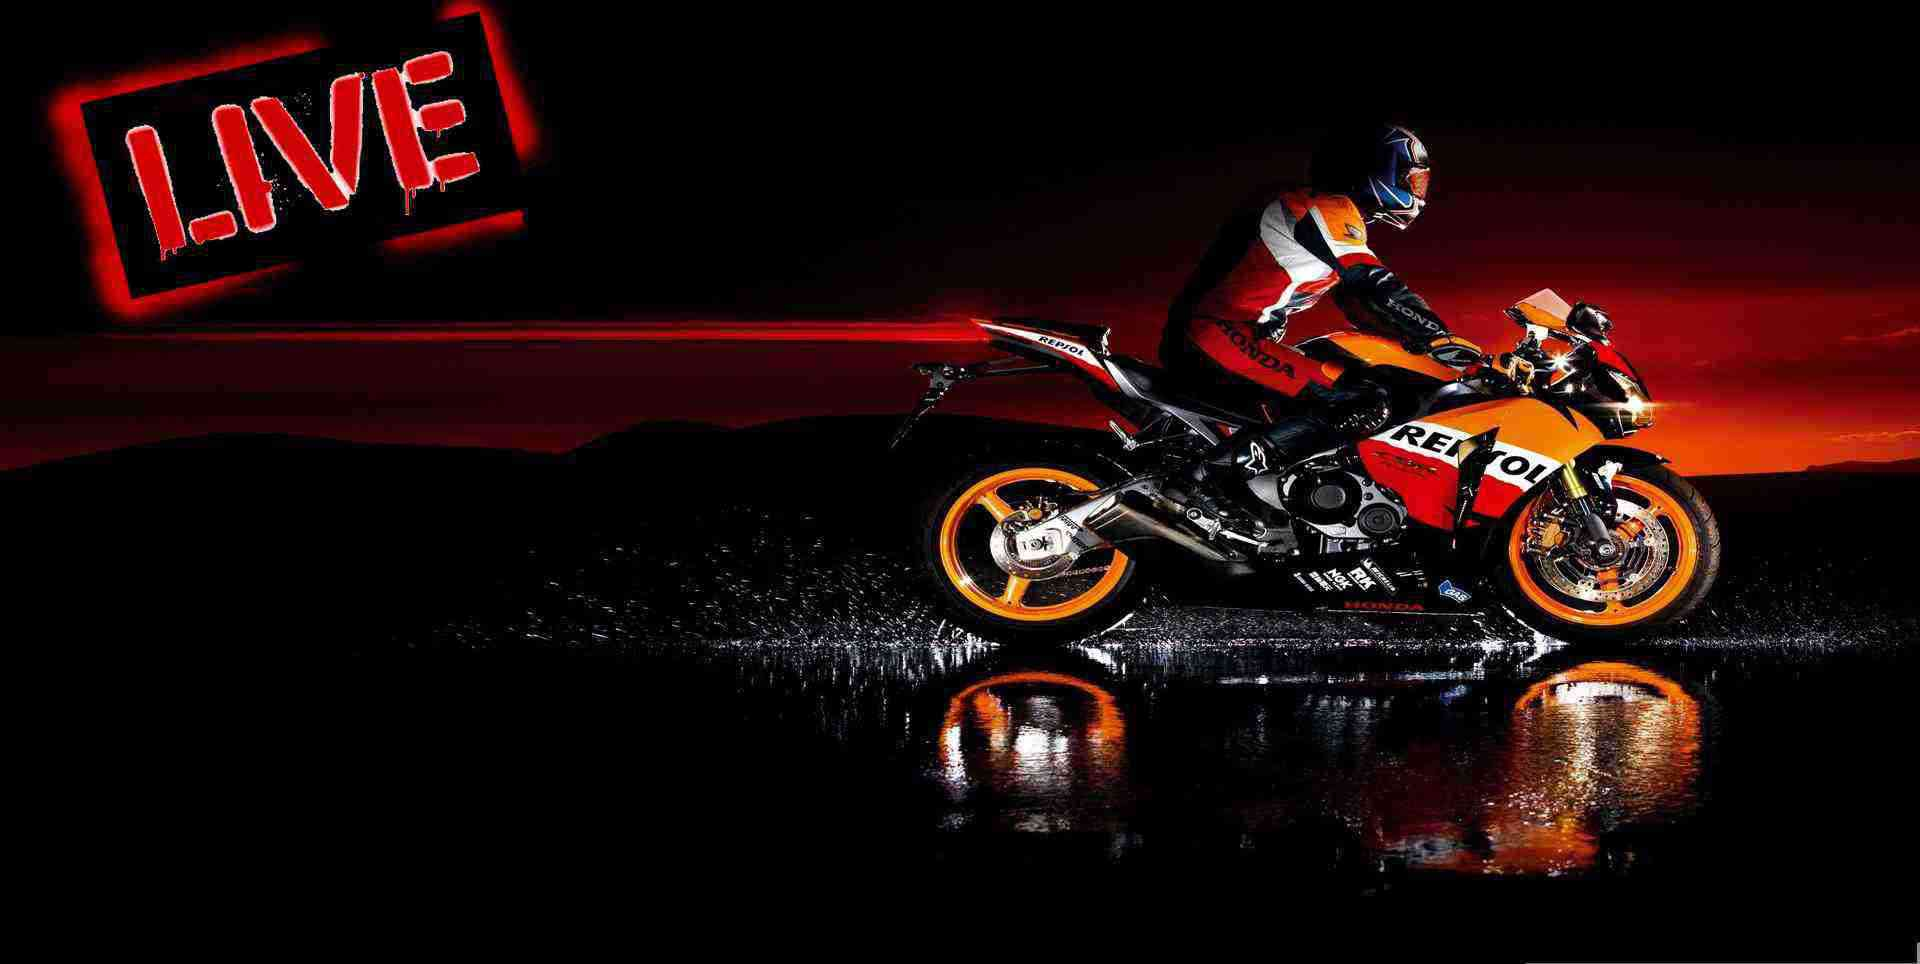 Motogp Catalunya Grand Prix 2015 Live Online